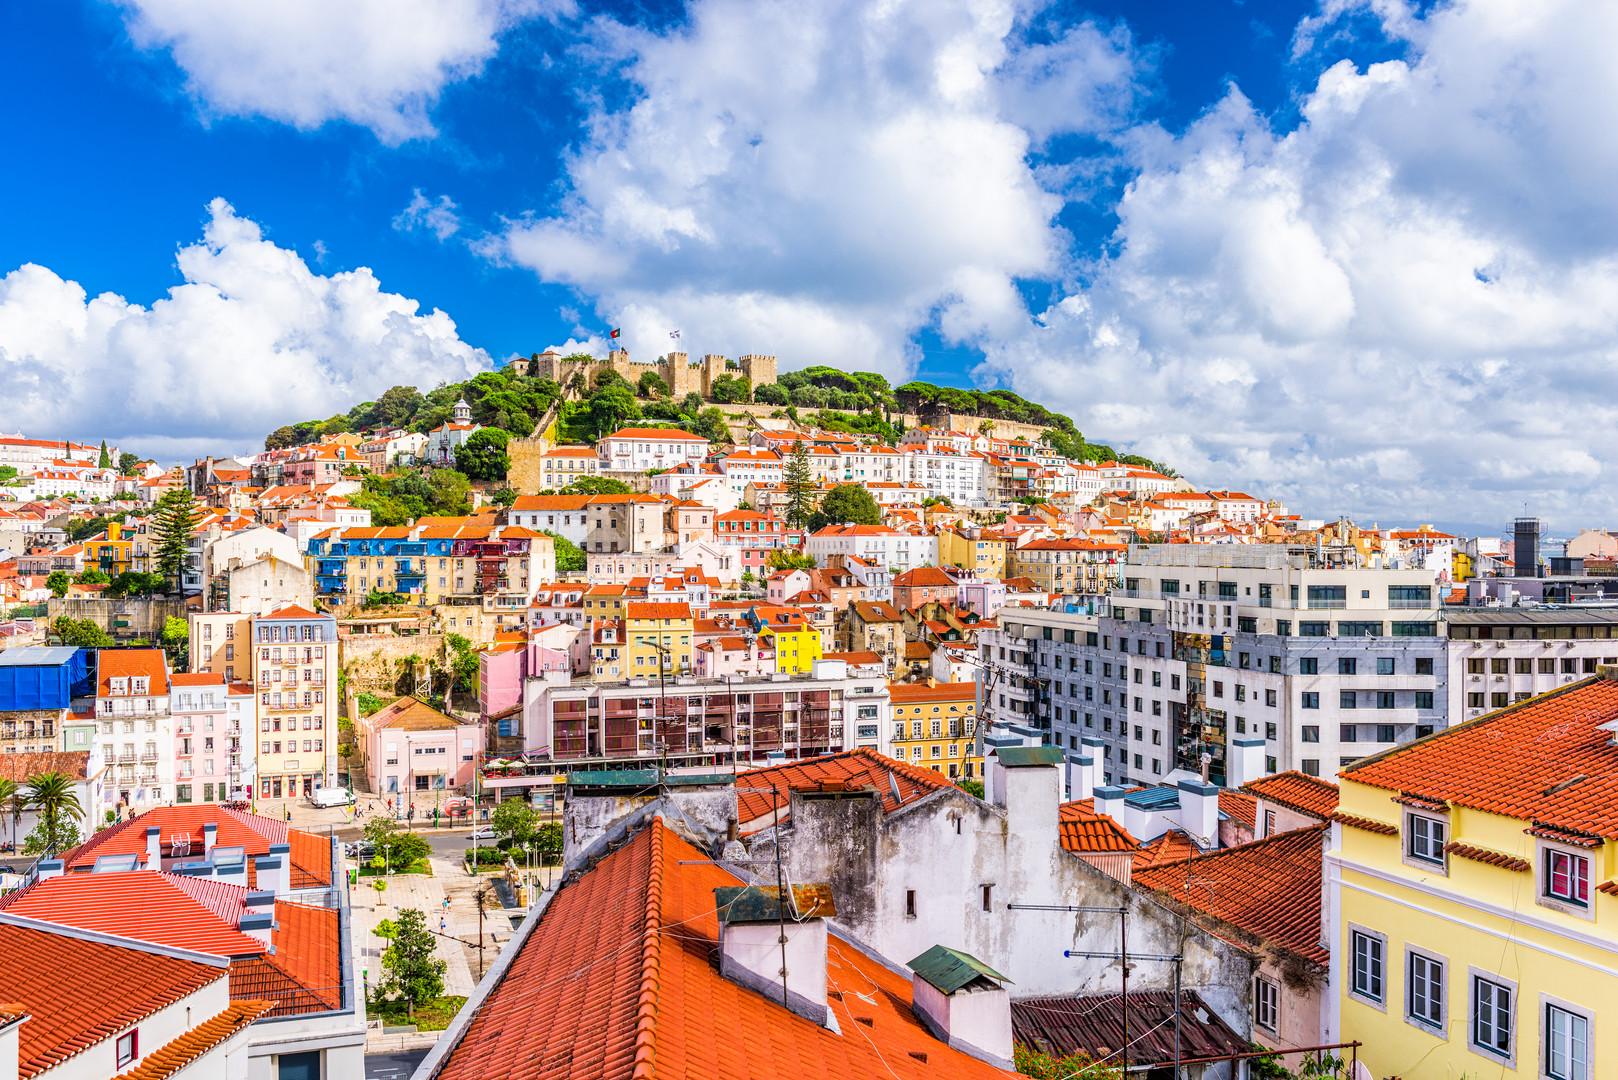 lisbon-portugal-city-skyline-PQRVKDF.jpg